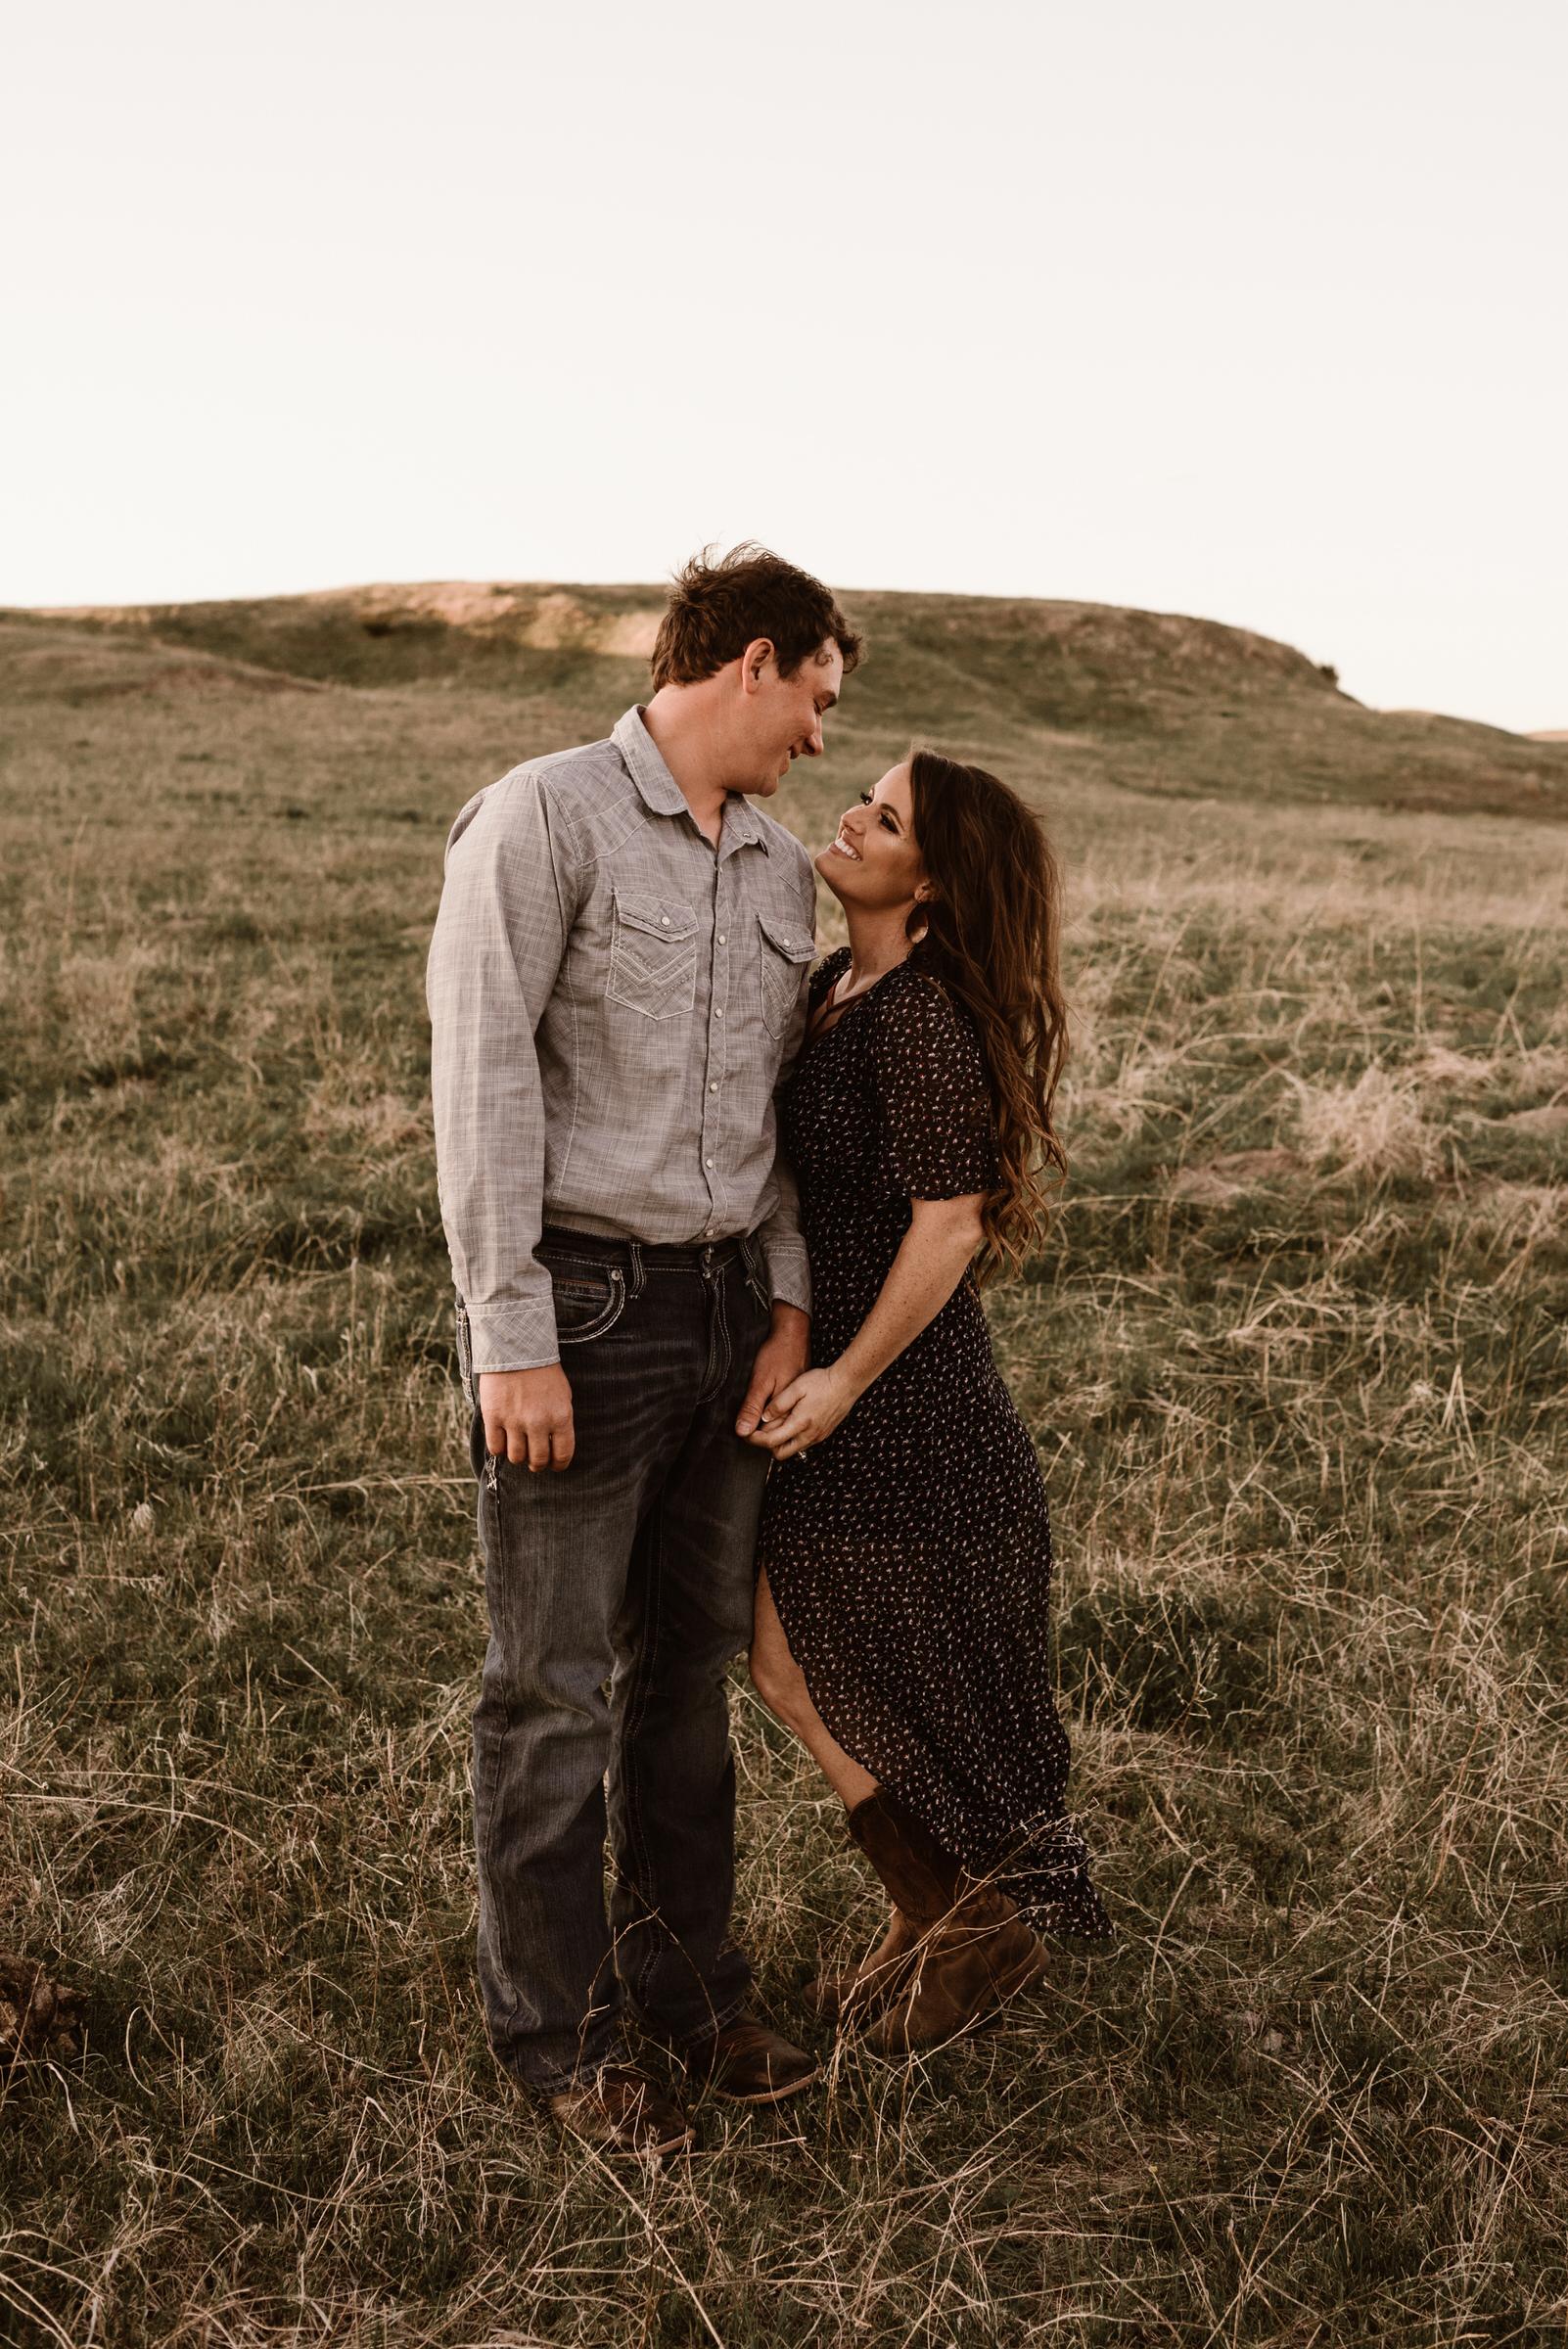 Sandhills-Nebraska-Engagement-Wedding-Photographer-Kaylie-Sirek-Photography-020.jpg